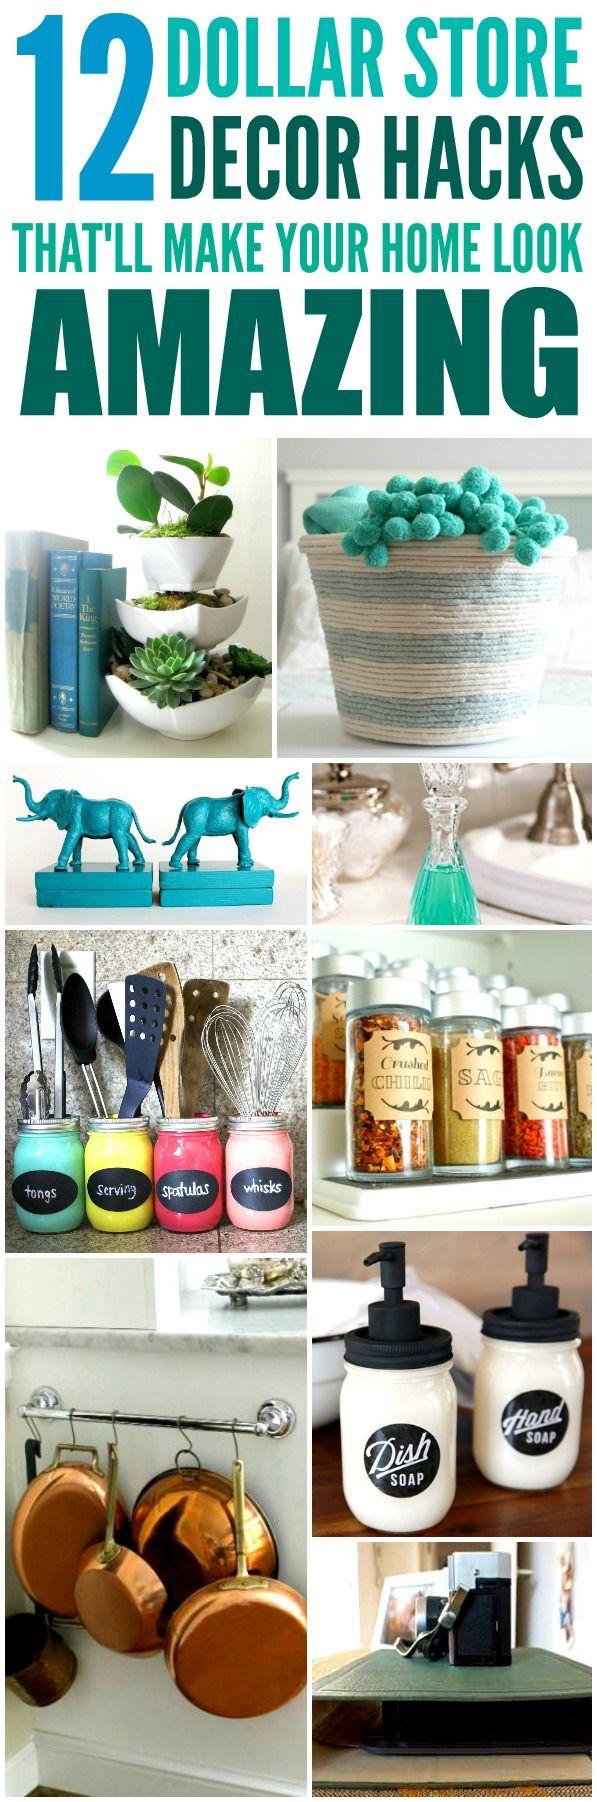 Best 25 Budget Decorating Ideas On Pinterest Cheap House Decor